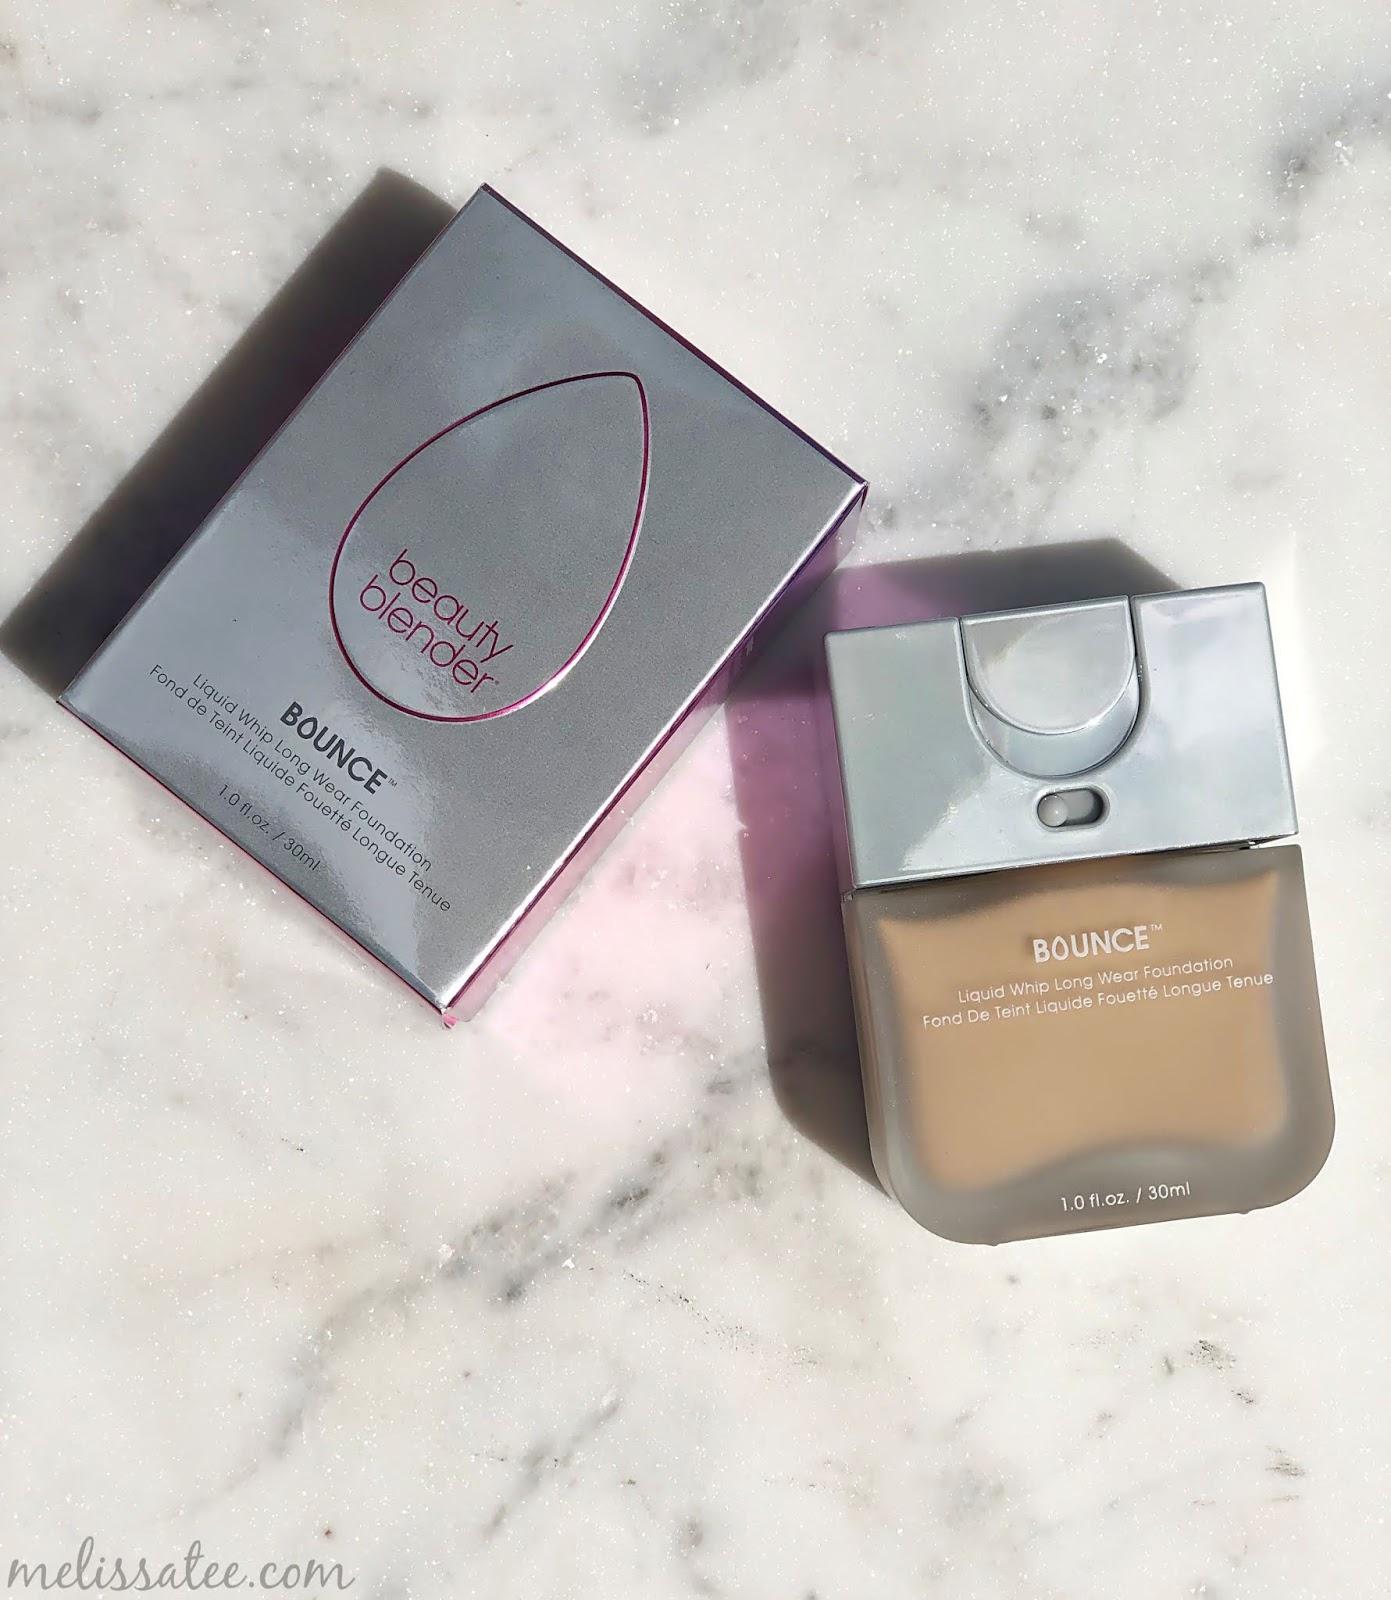 Beauty Blender Foundation: The Blushing Introvert: Beauty Blender Bounce Liquid Whip